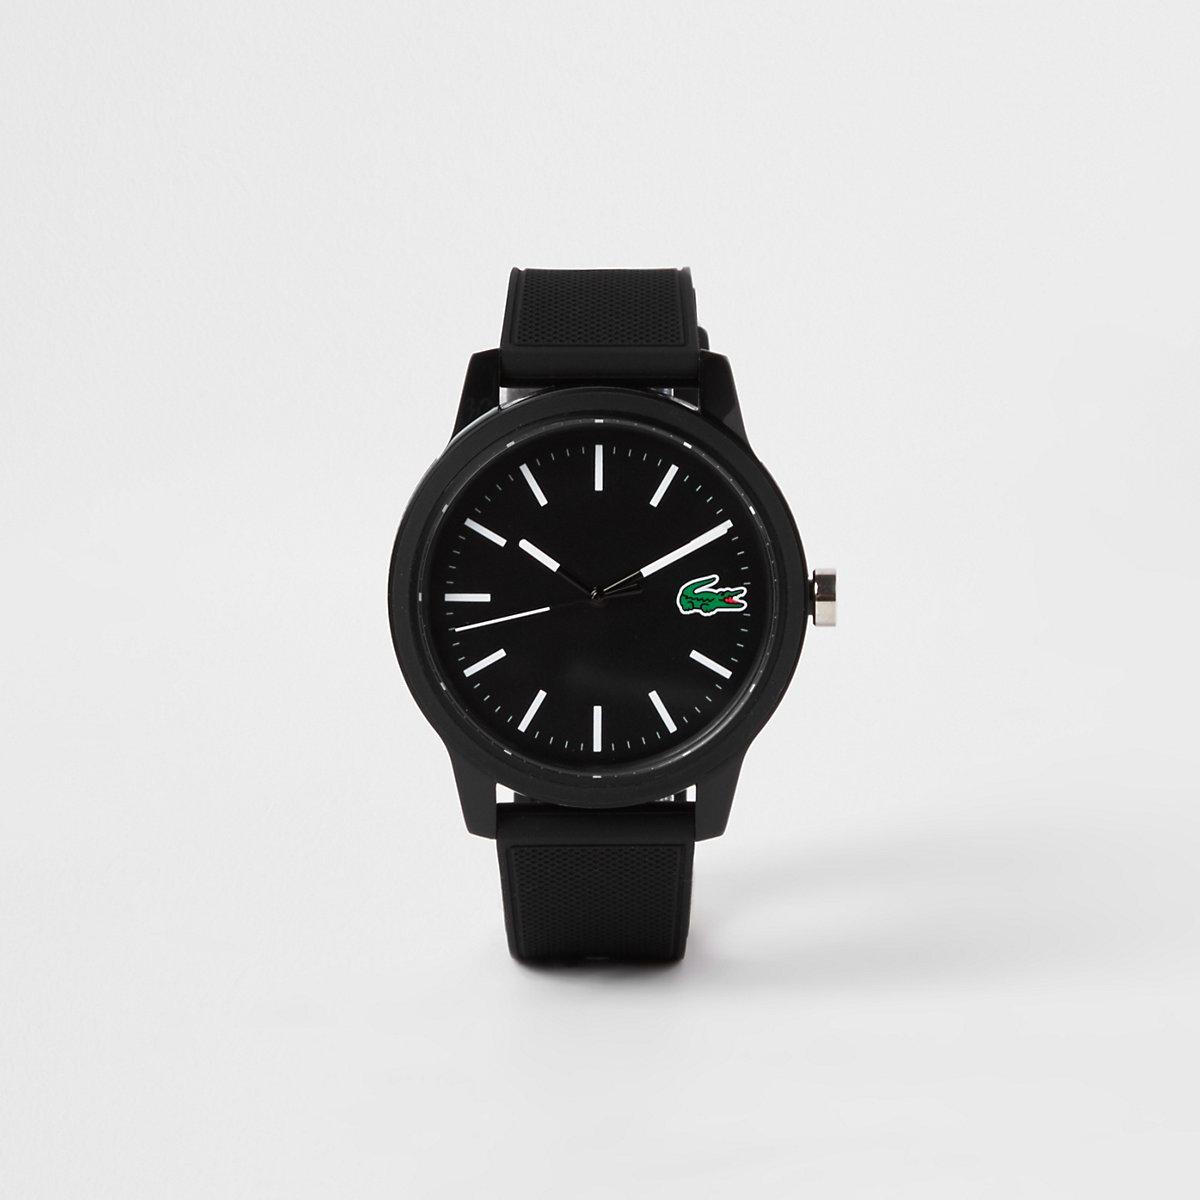 Lacoste black 12.12 silicone strap watch